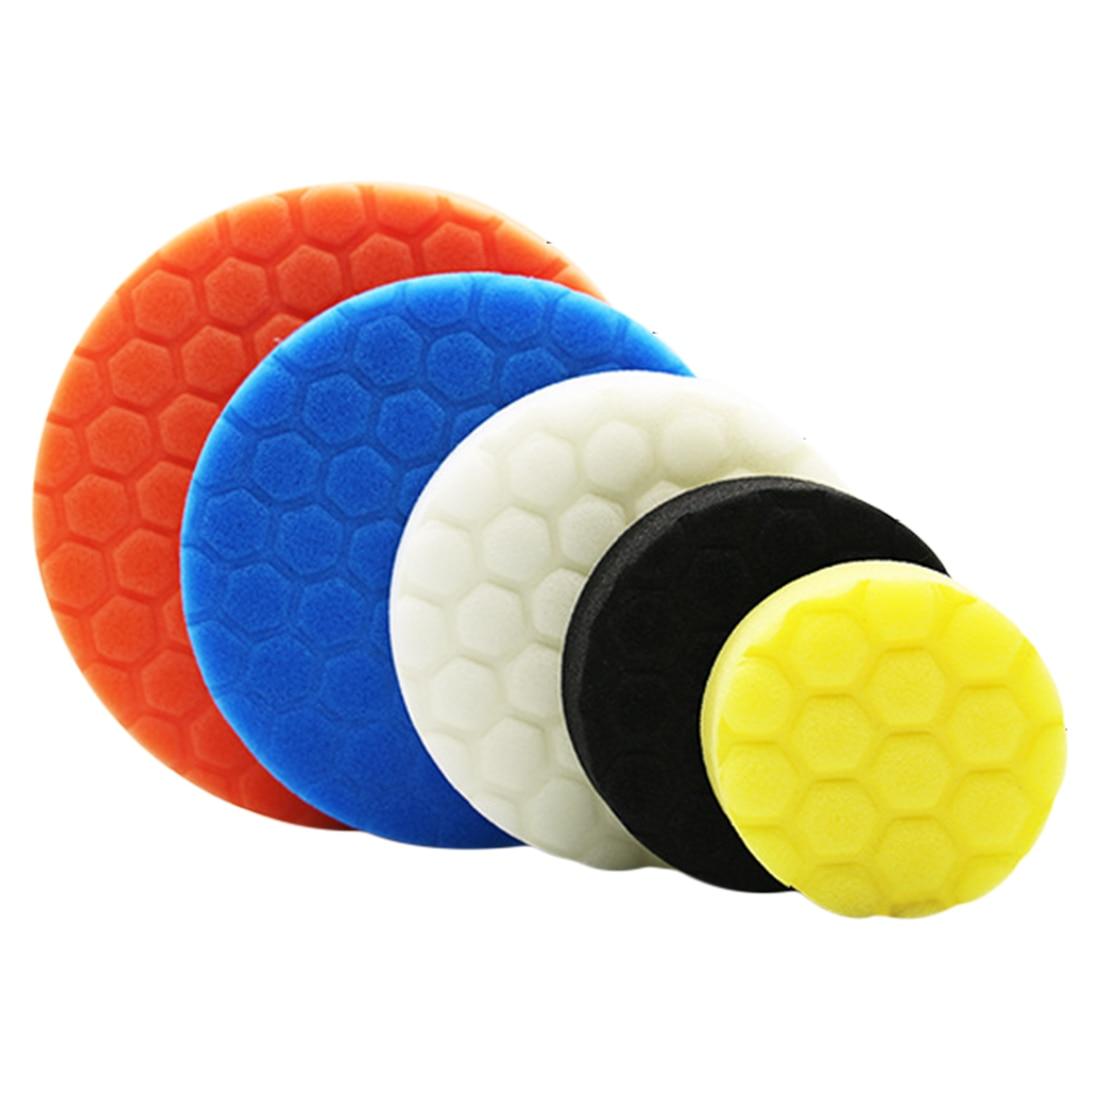 5Pcs Hexagonal Polished Sponge Disc Buffing Sponge Waxing Polishing Pad Kit Set For Car Polisher Car Accessories 3/4/5/6/7inch|Polishing Disc| - AliExpress